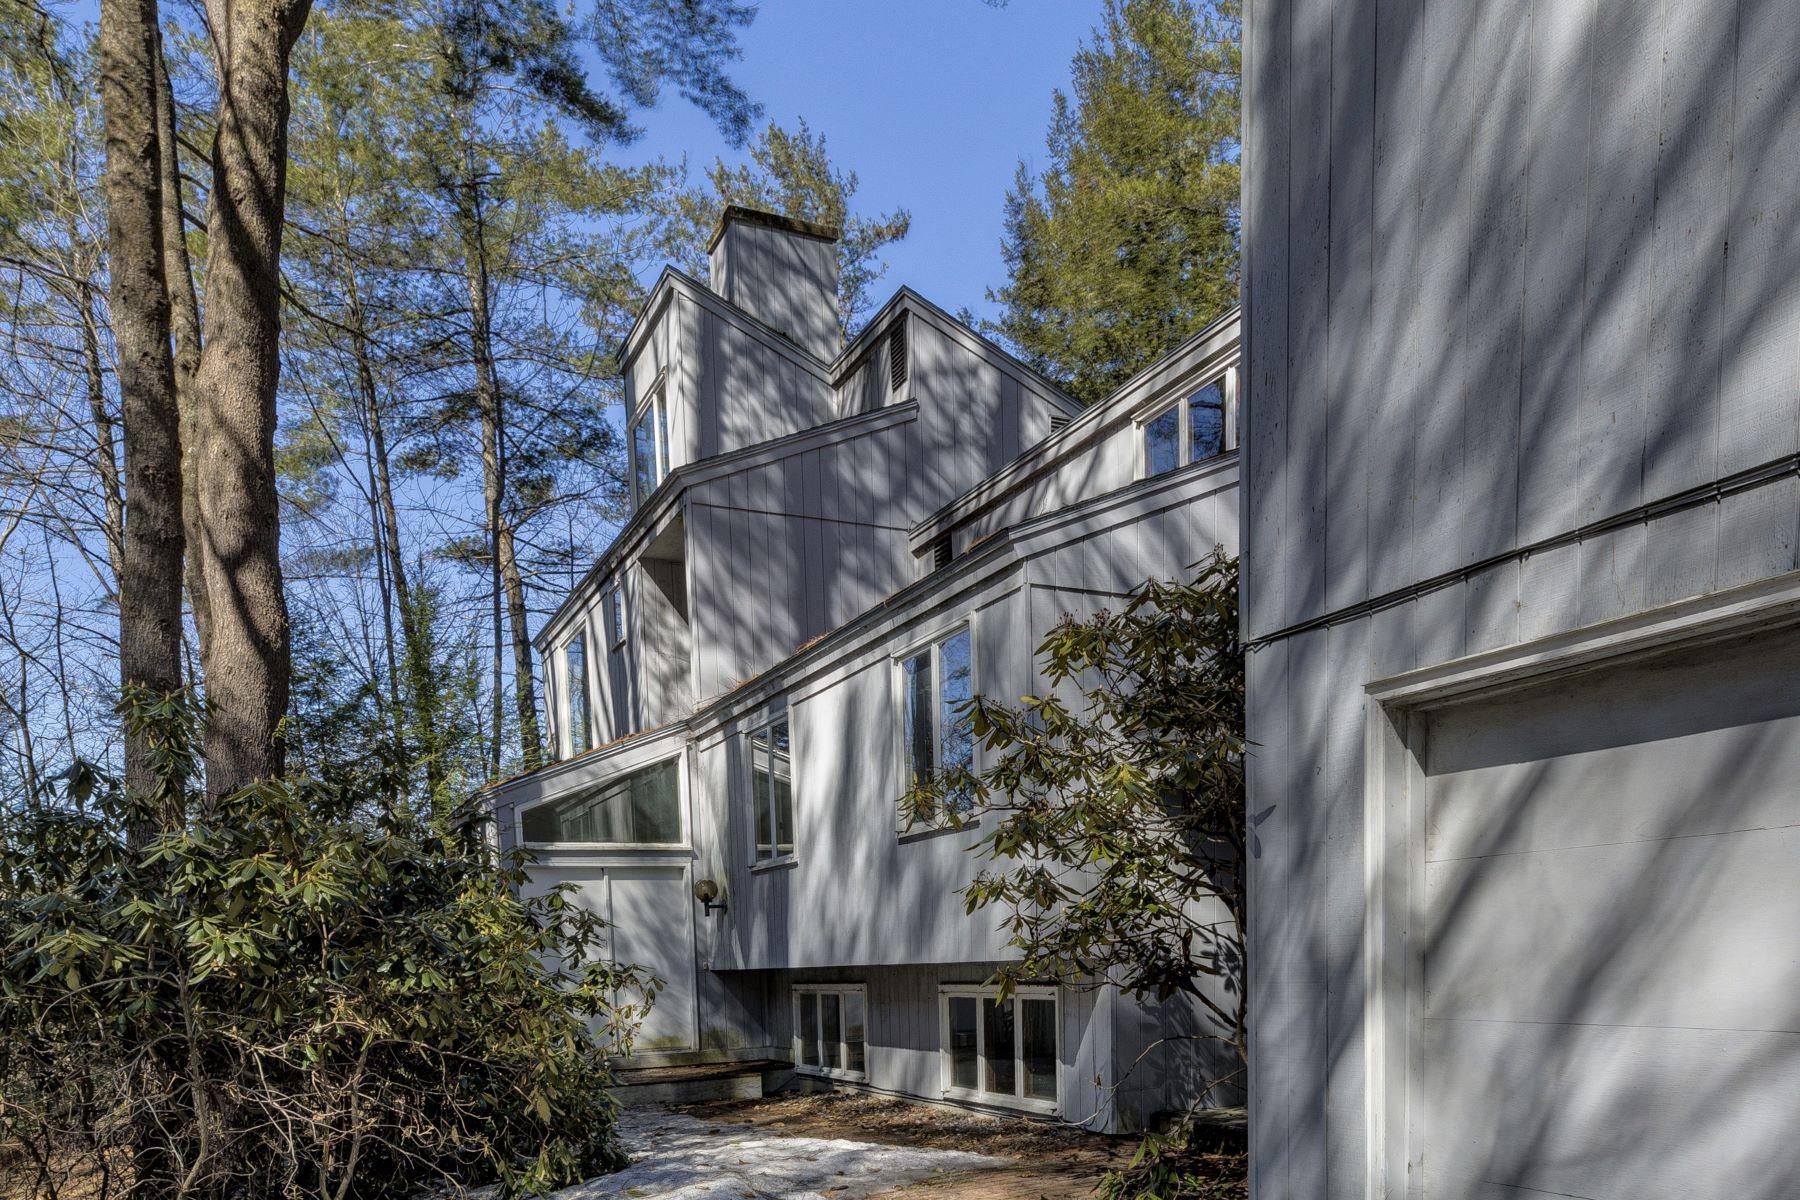 Single Family Home for Sale at 37 Highland Avenue, Lebanon 37 Highland Ave Lebanon, New Hampshire 03784 United States